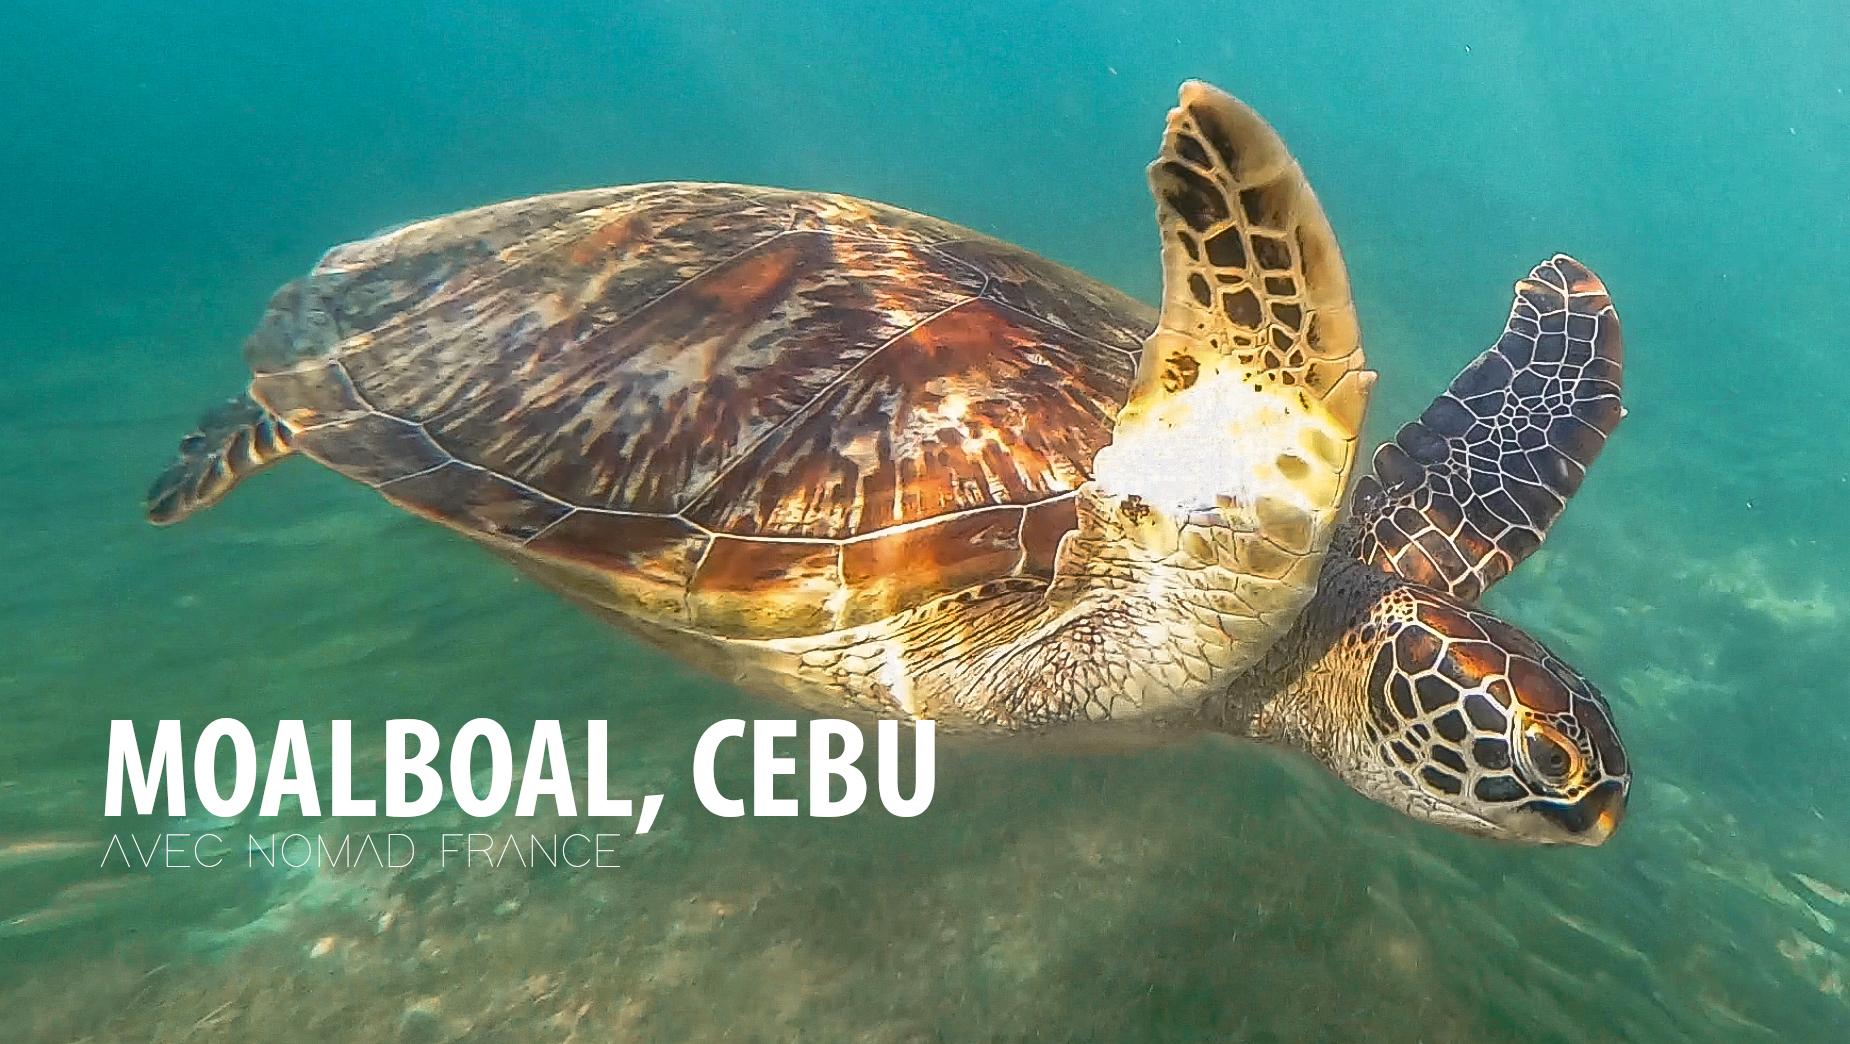 Moalboal Village De Pêcheur De Cebu Nomad France